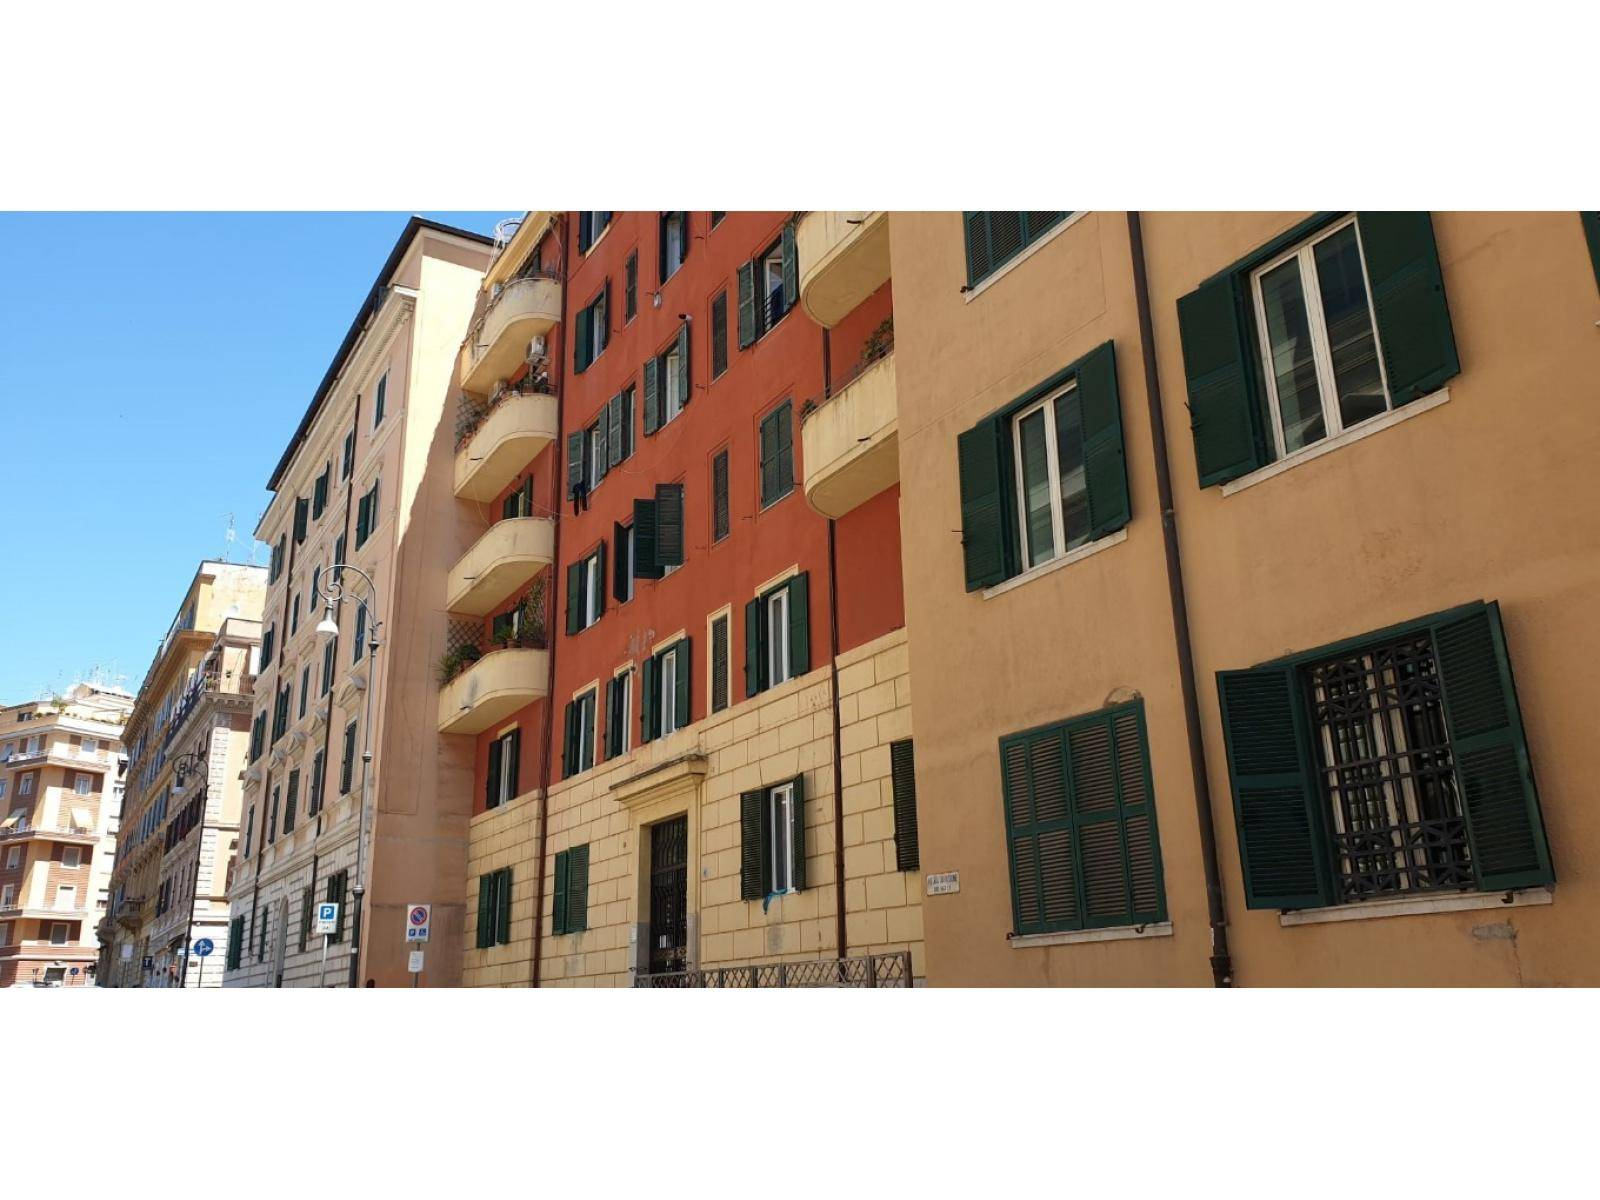 1118417754 Bilocale in Via Tasso, Roma, Zona Esquilino